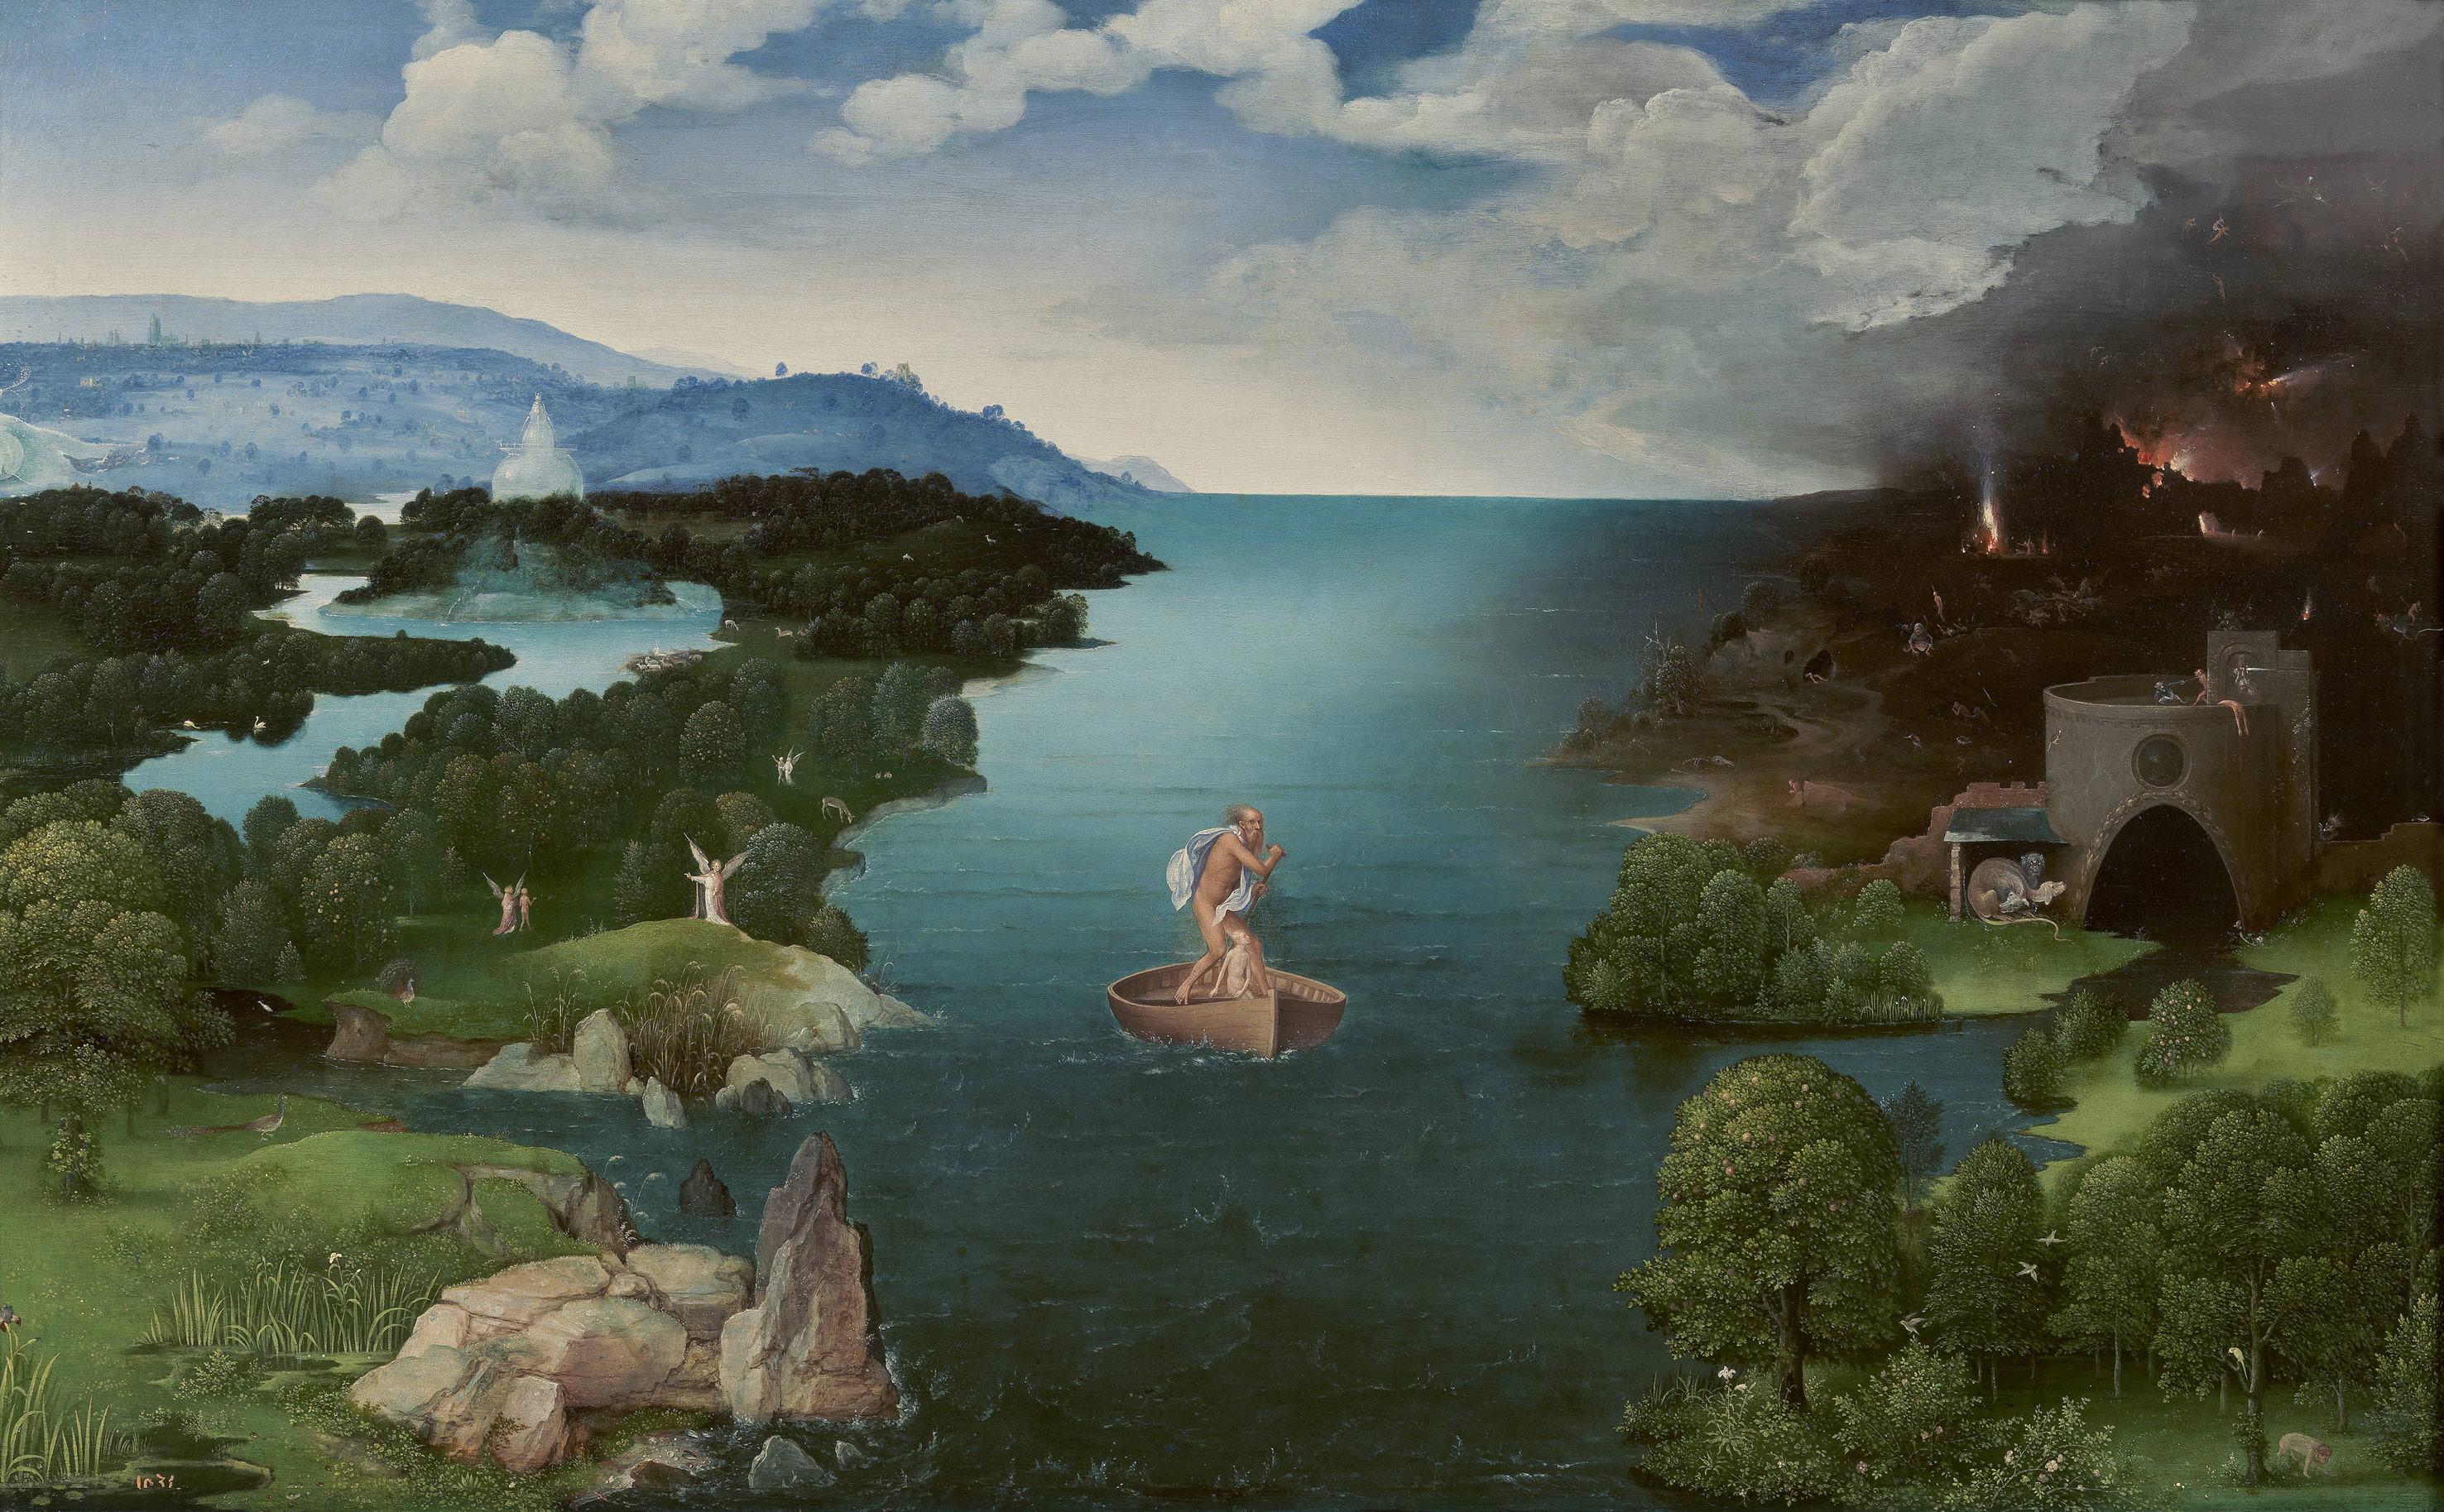 Joachim Patinir, Crossing the River Styx, 1515-24 14075791280.jpg